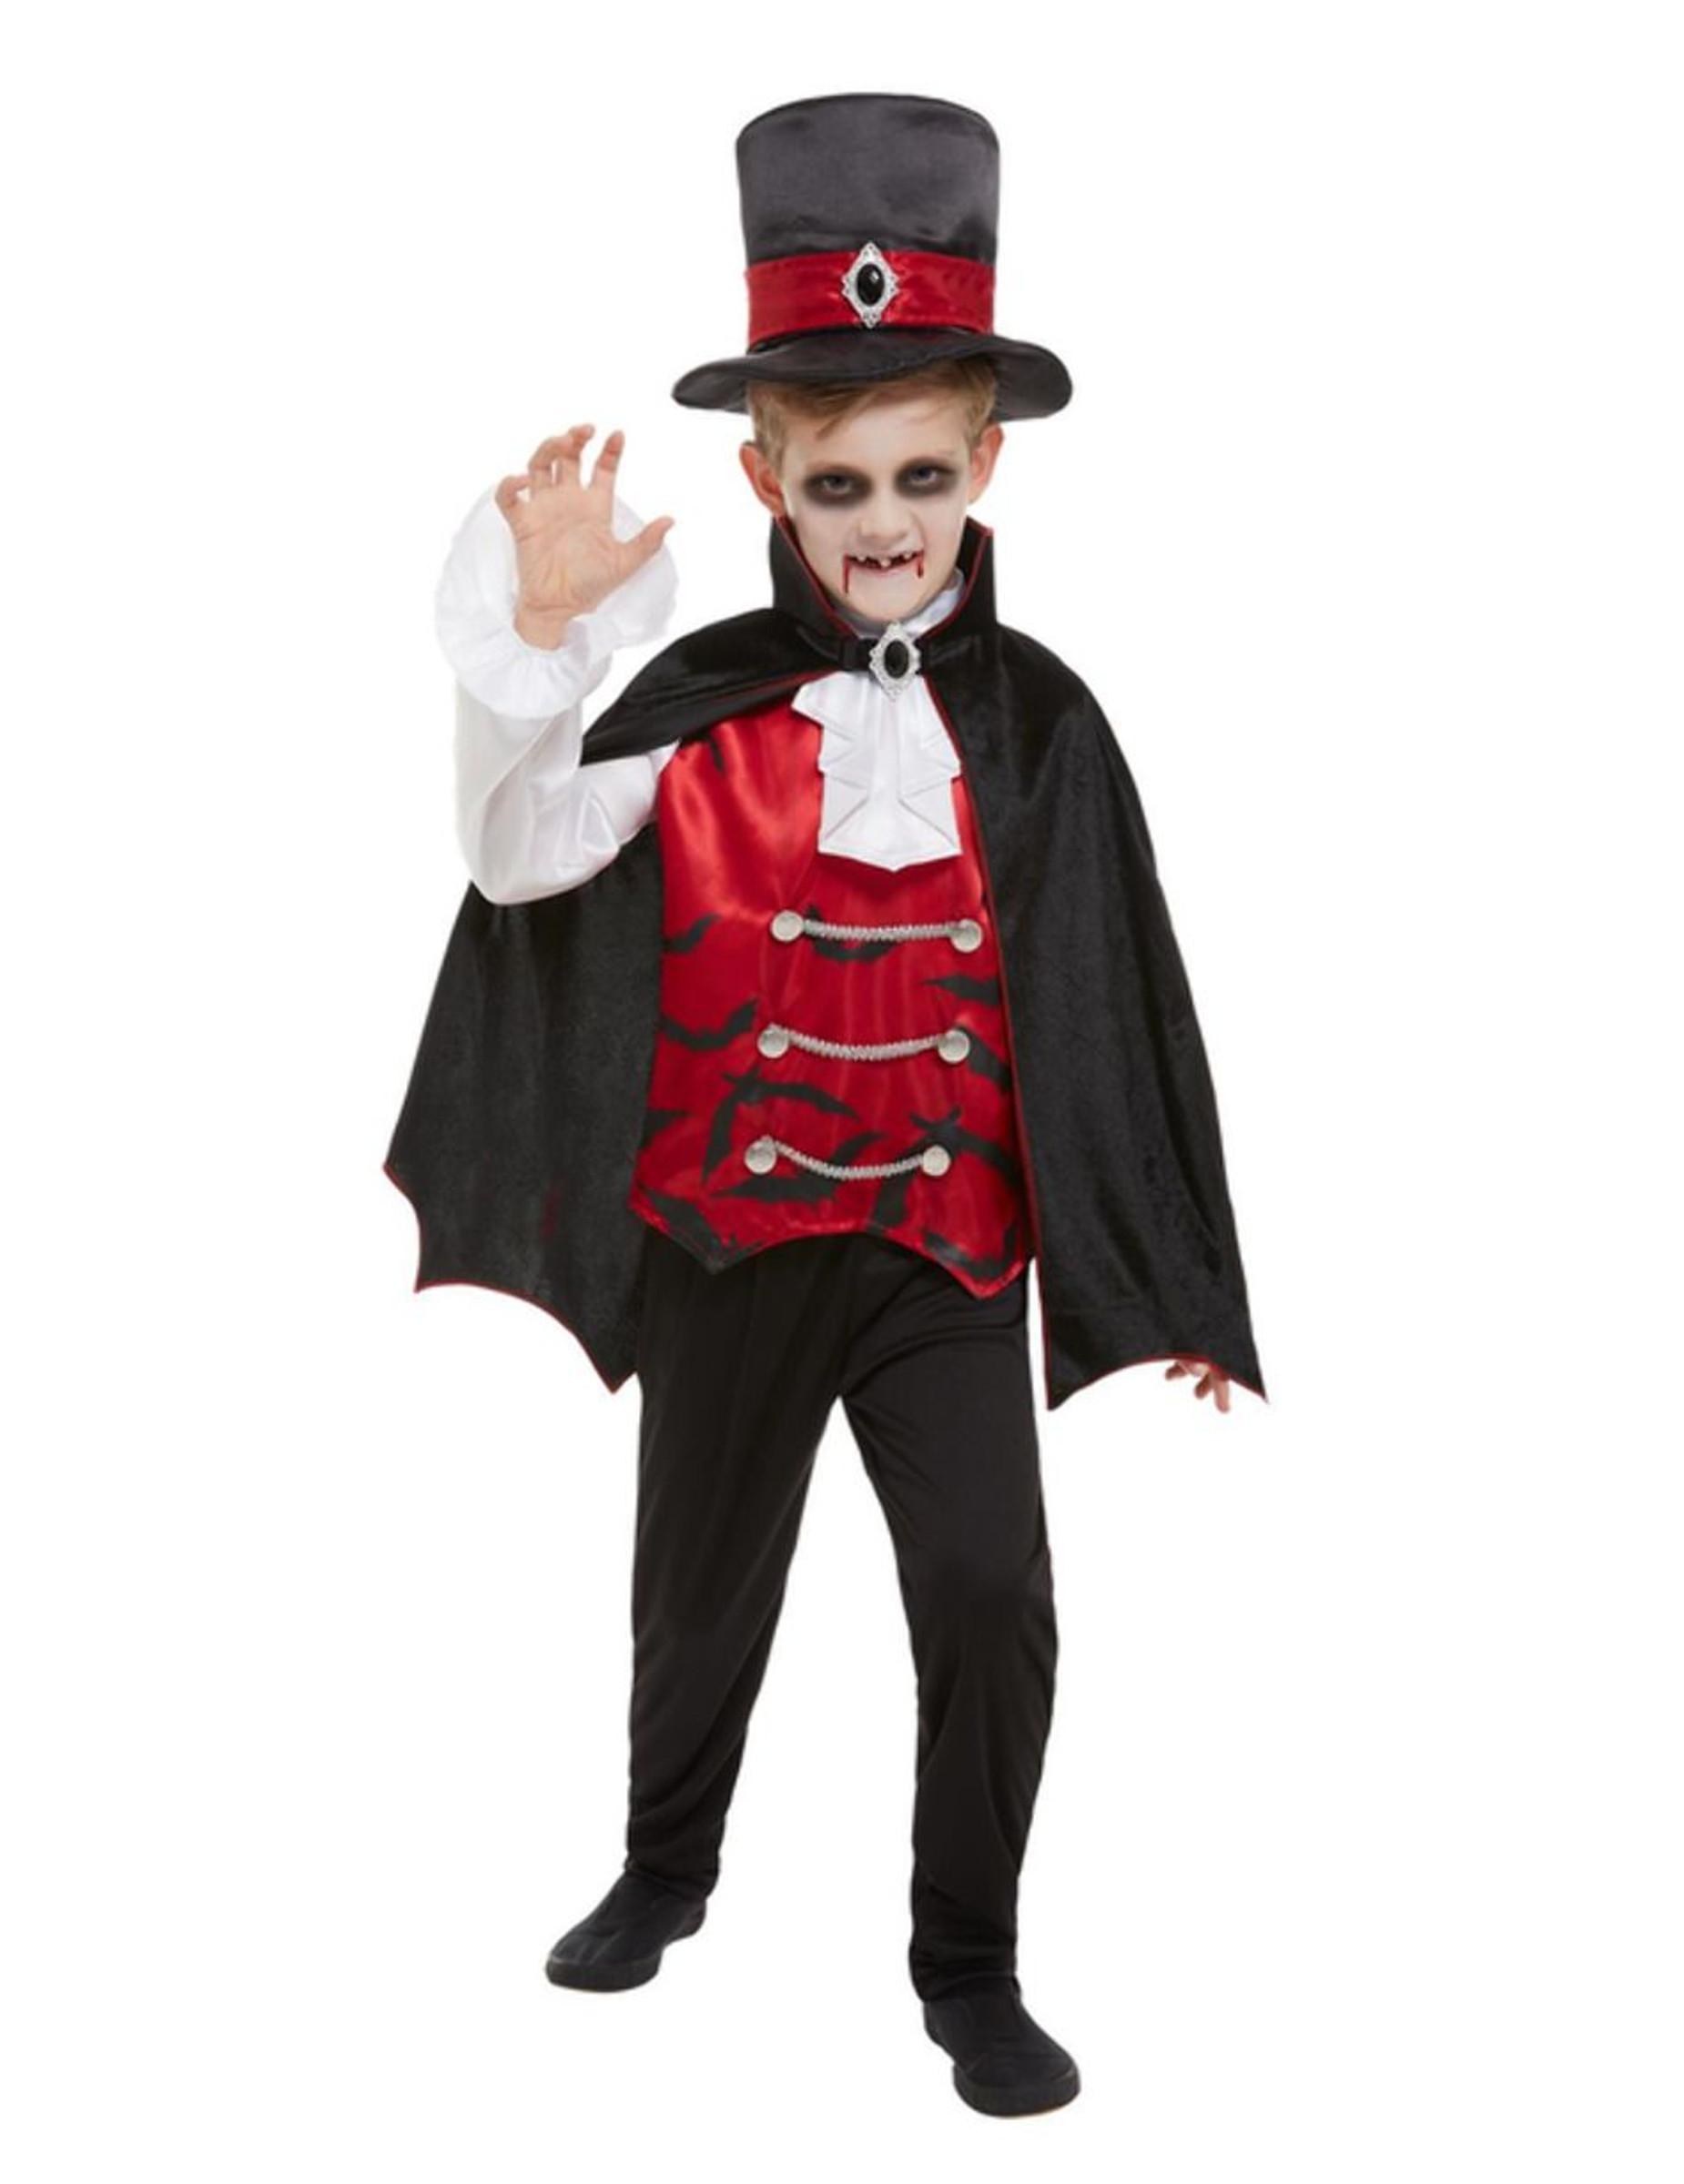 Vampire Toddler bambini Costume Festa Di Halloween Bambini Costume 2-4